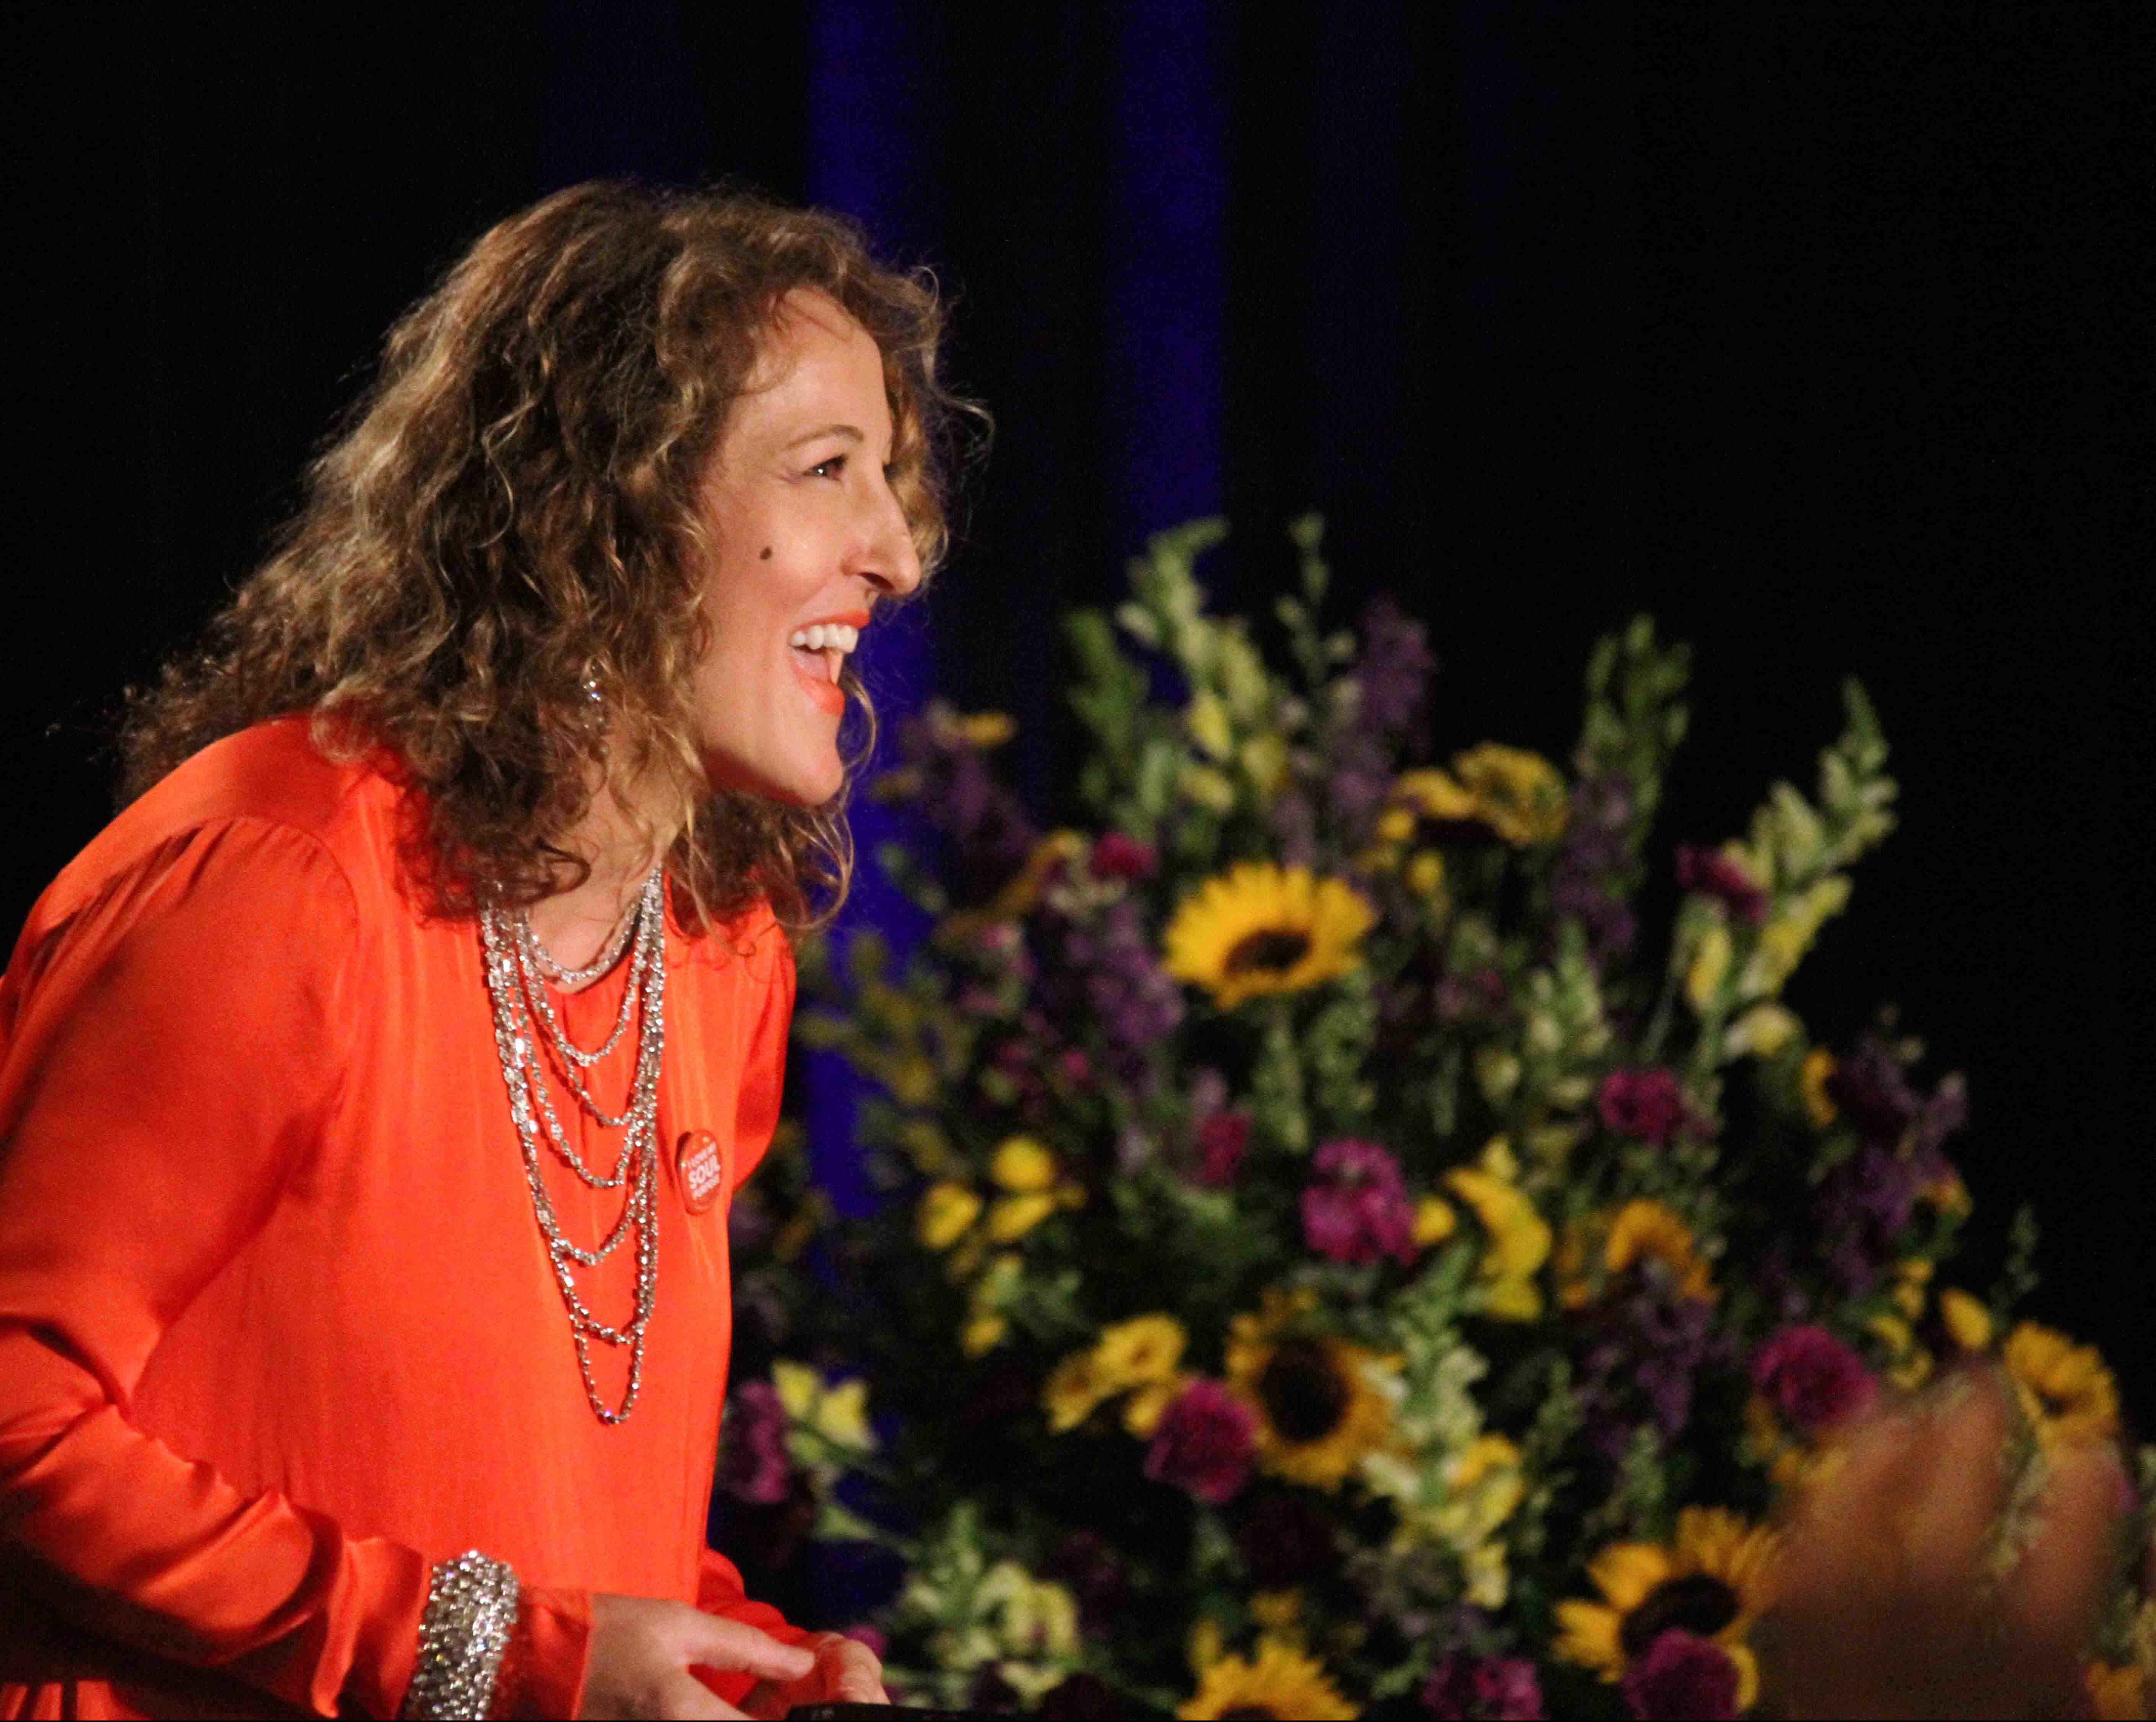 Sabine Messner Bio